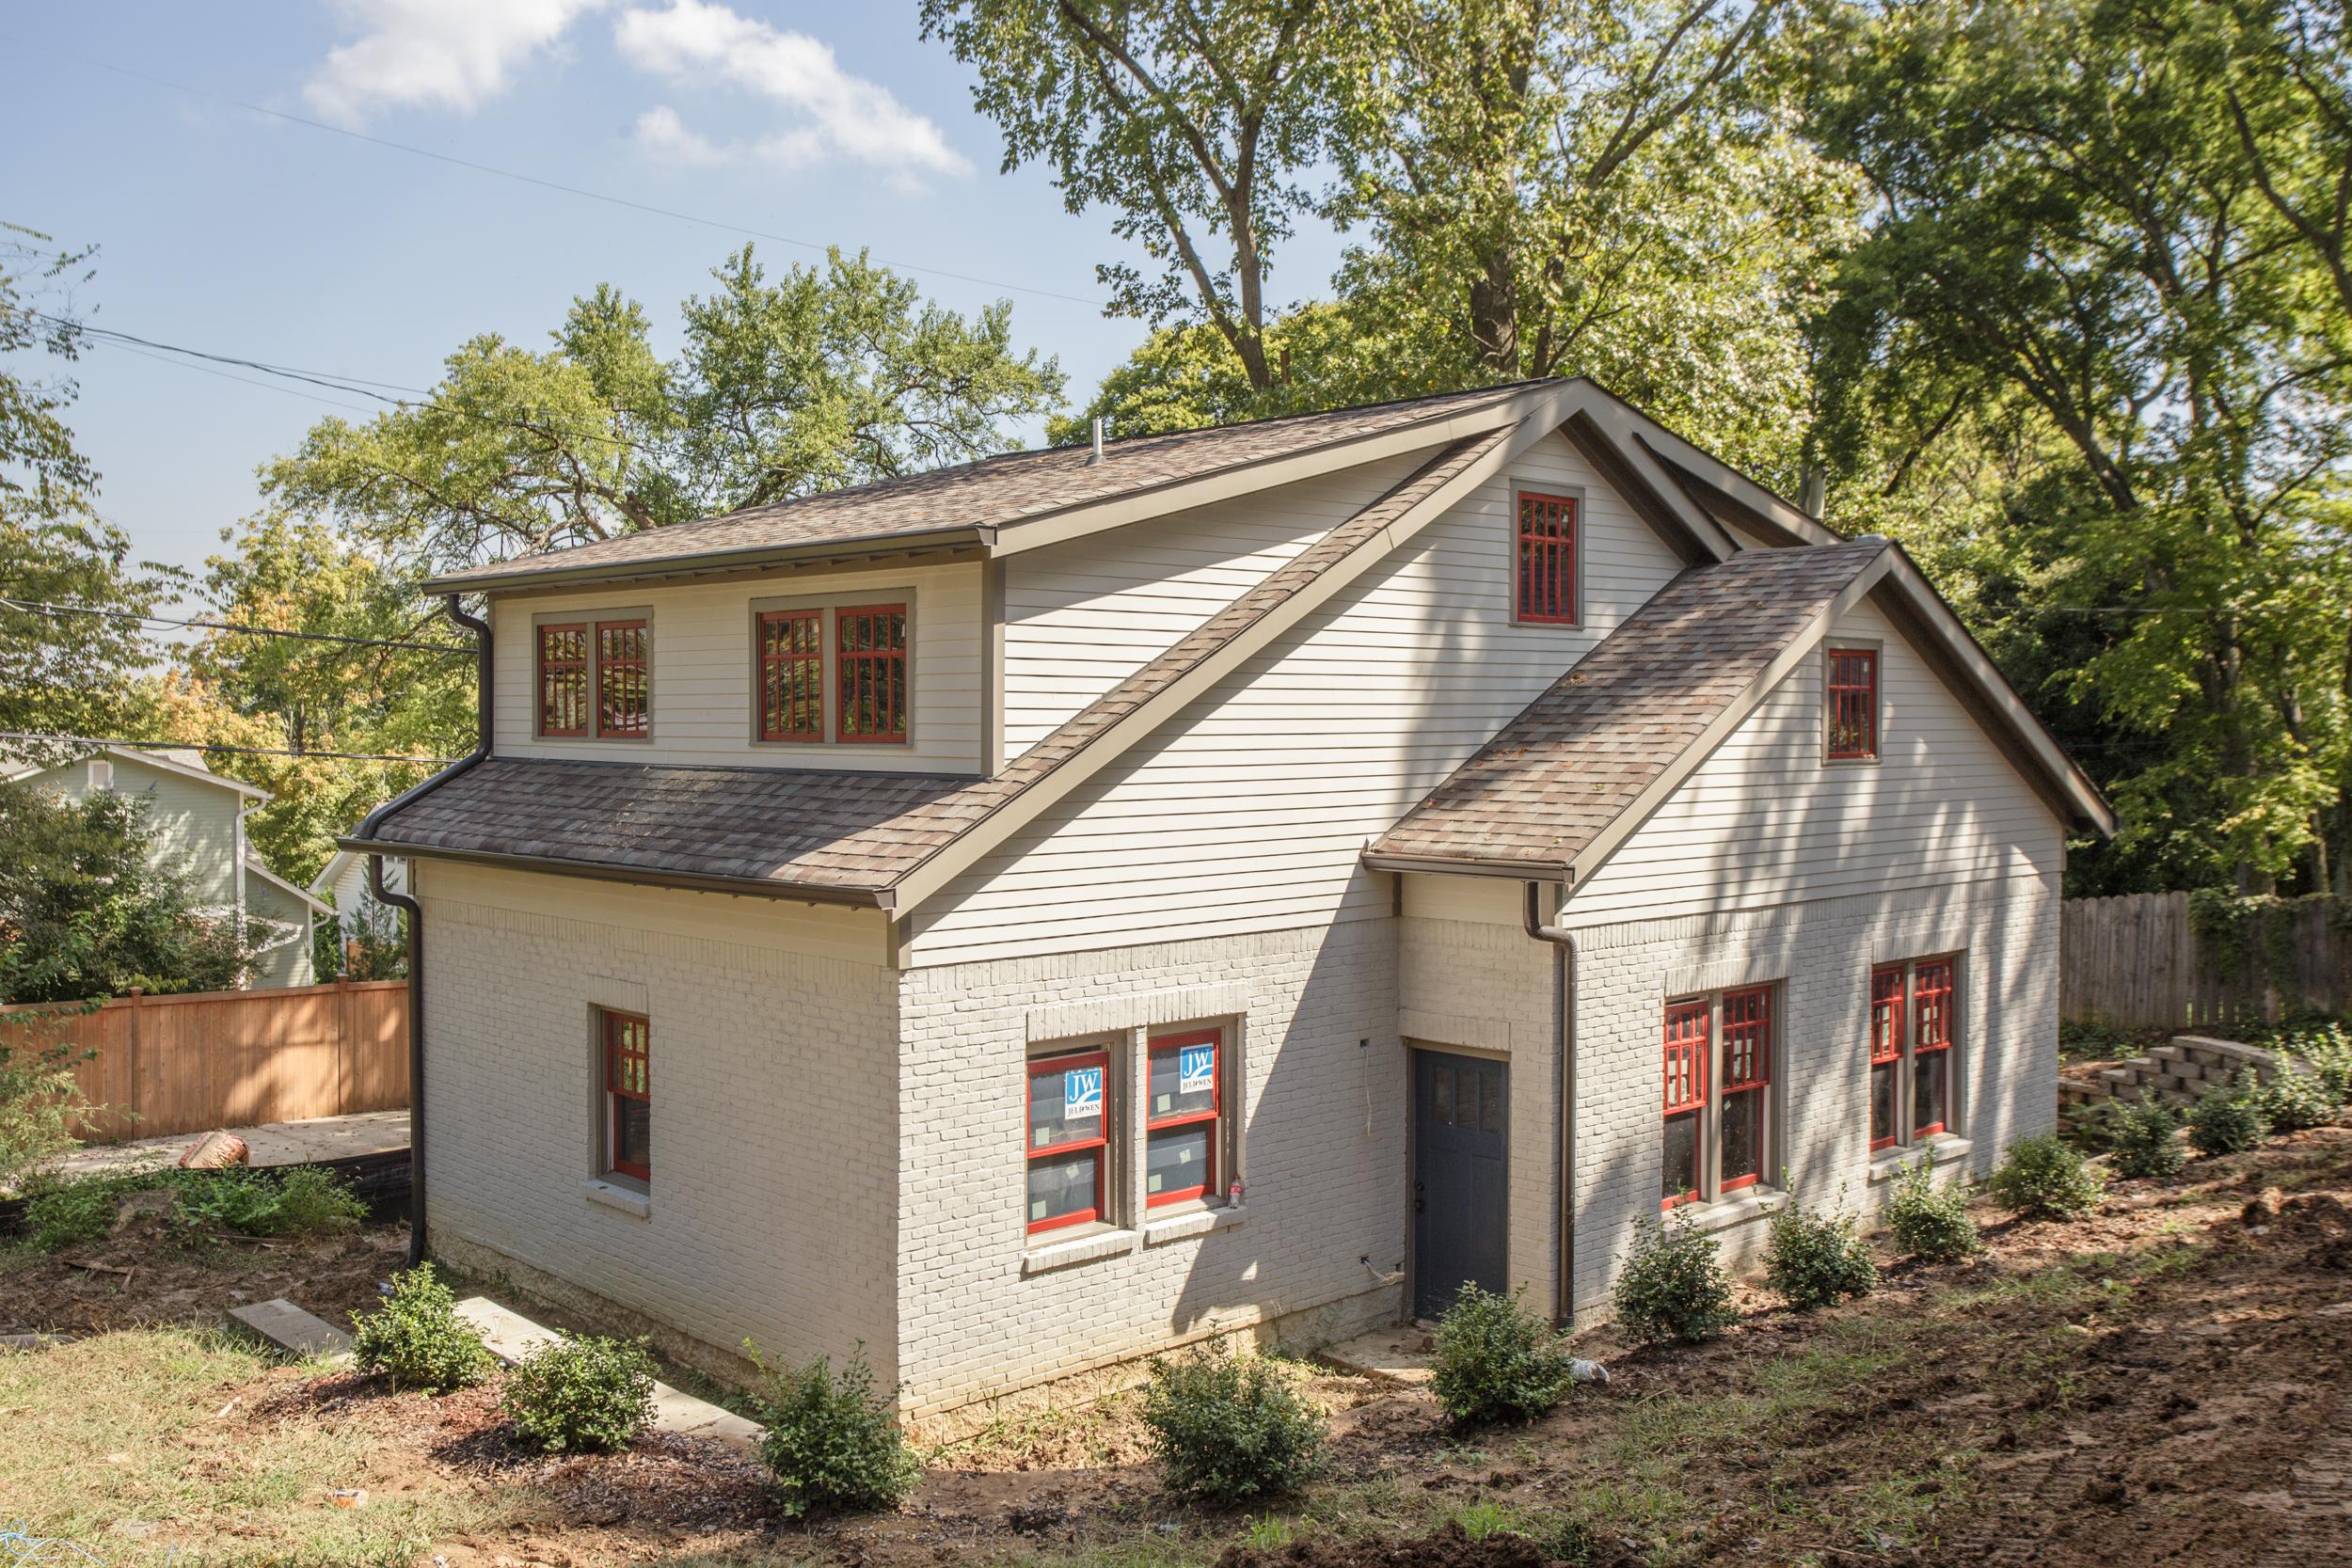 best-home-builder-nashville-renovation-historic-neighborhoods-britt-development-group-0217.jpg